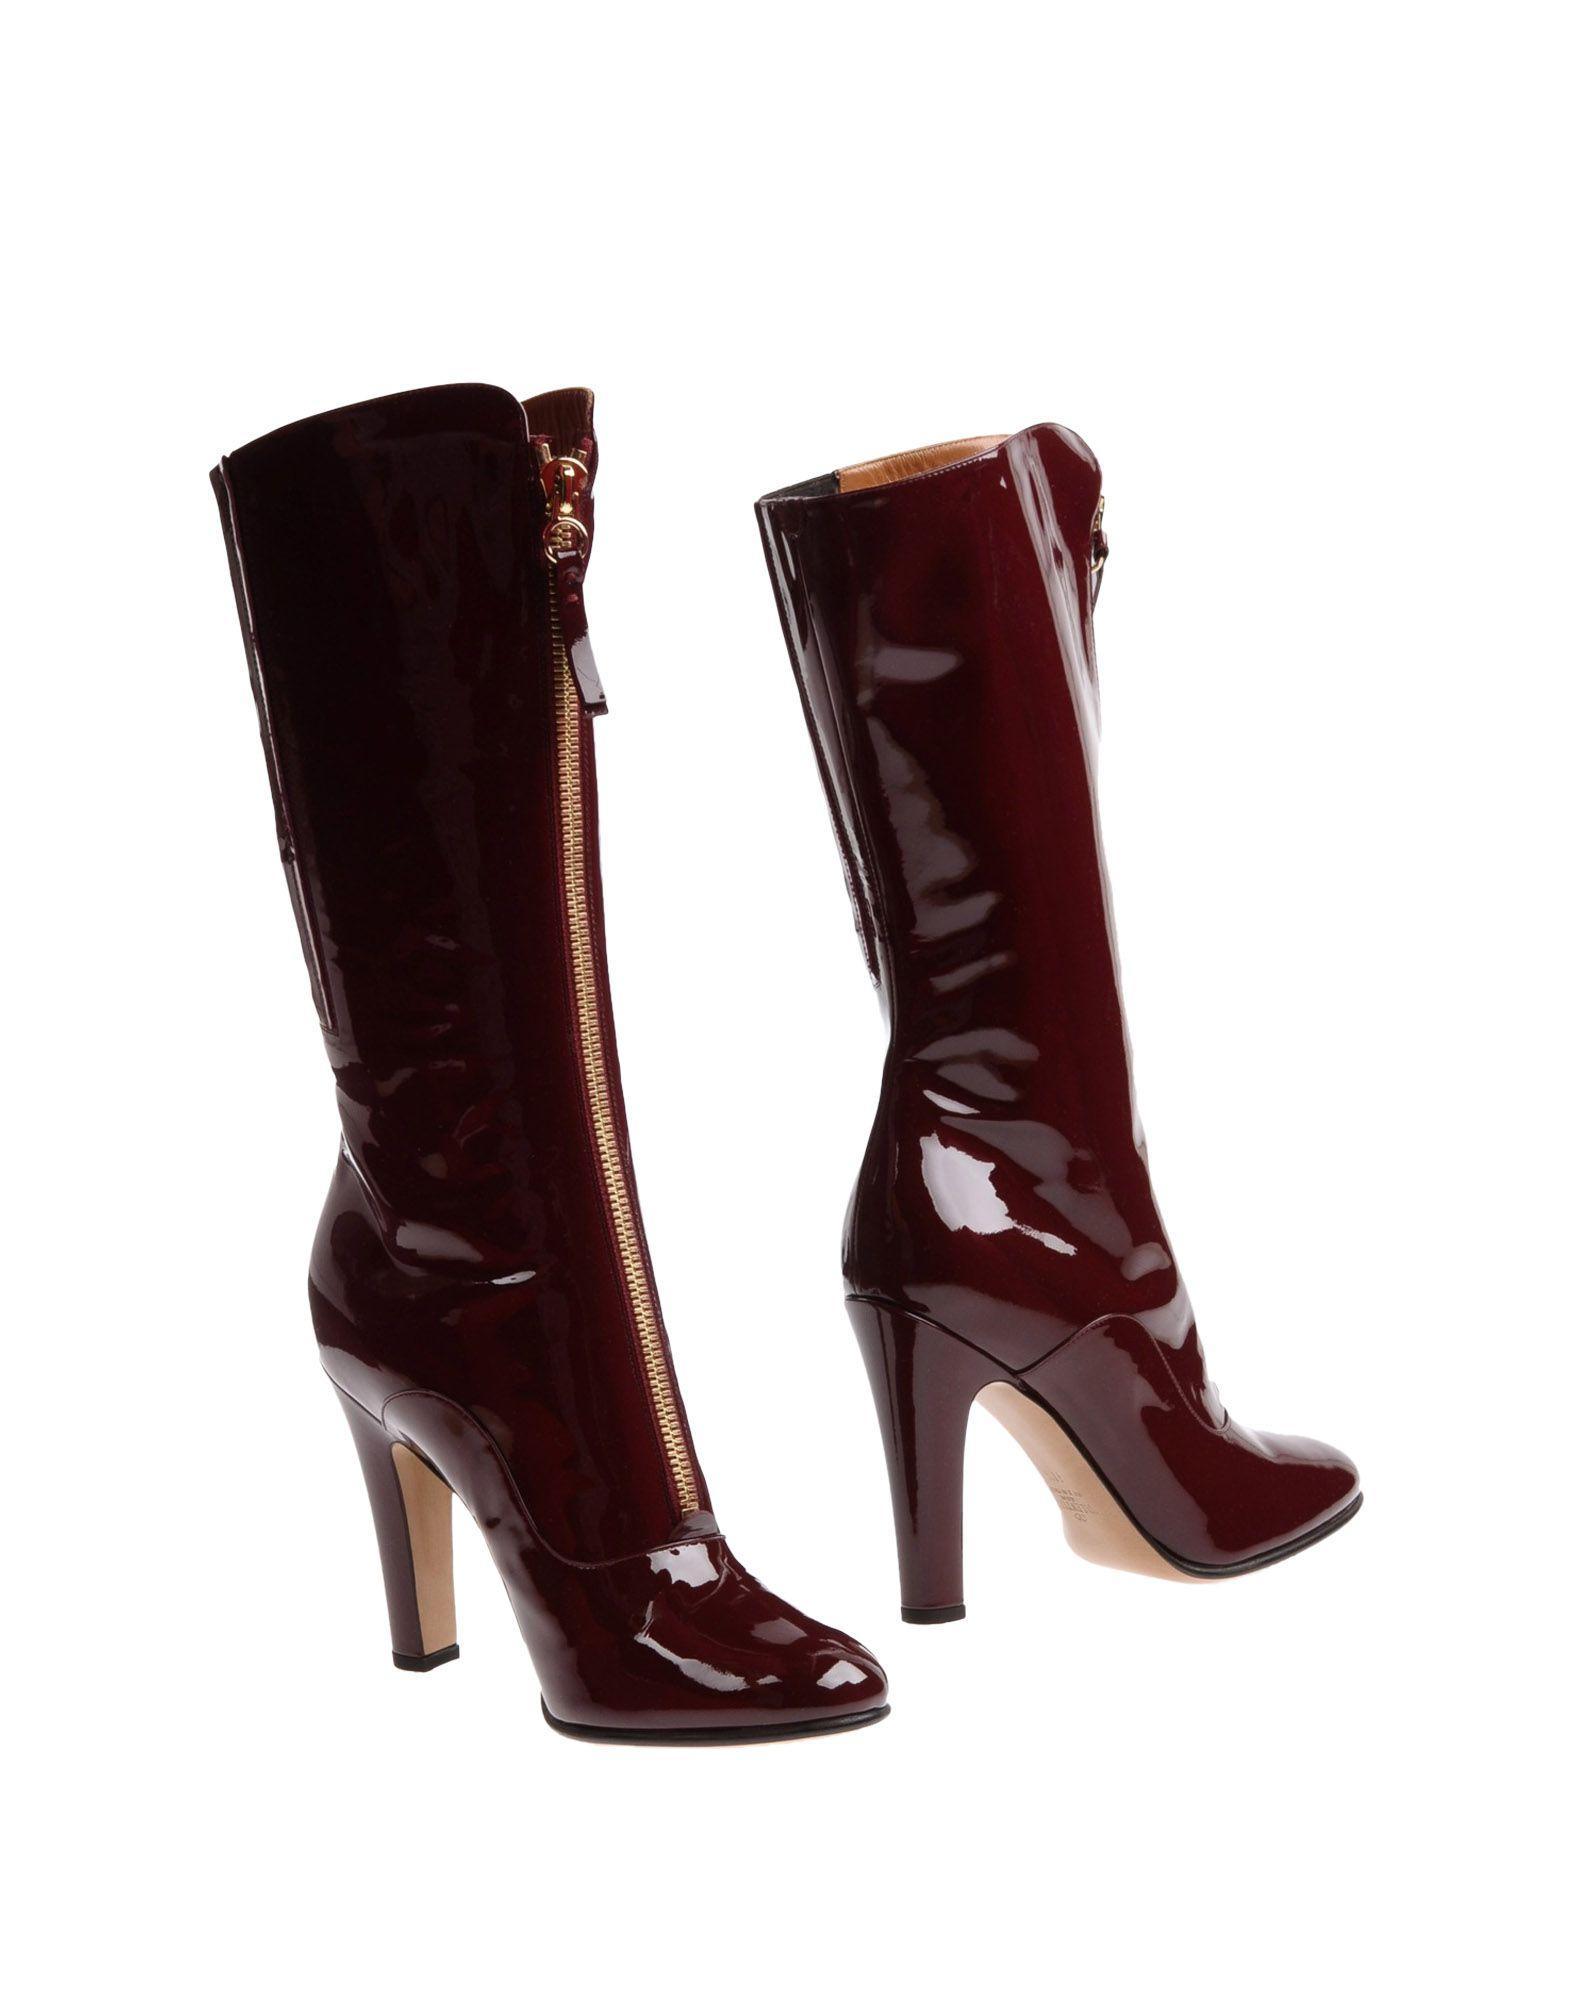 Valentino Garavani Ankle Boot Ankle - Women Valentino Garavani Ankle Boot Boots online on  Australia - 11277775GG 8c02c6